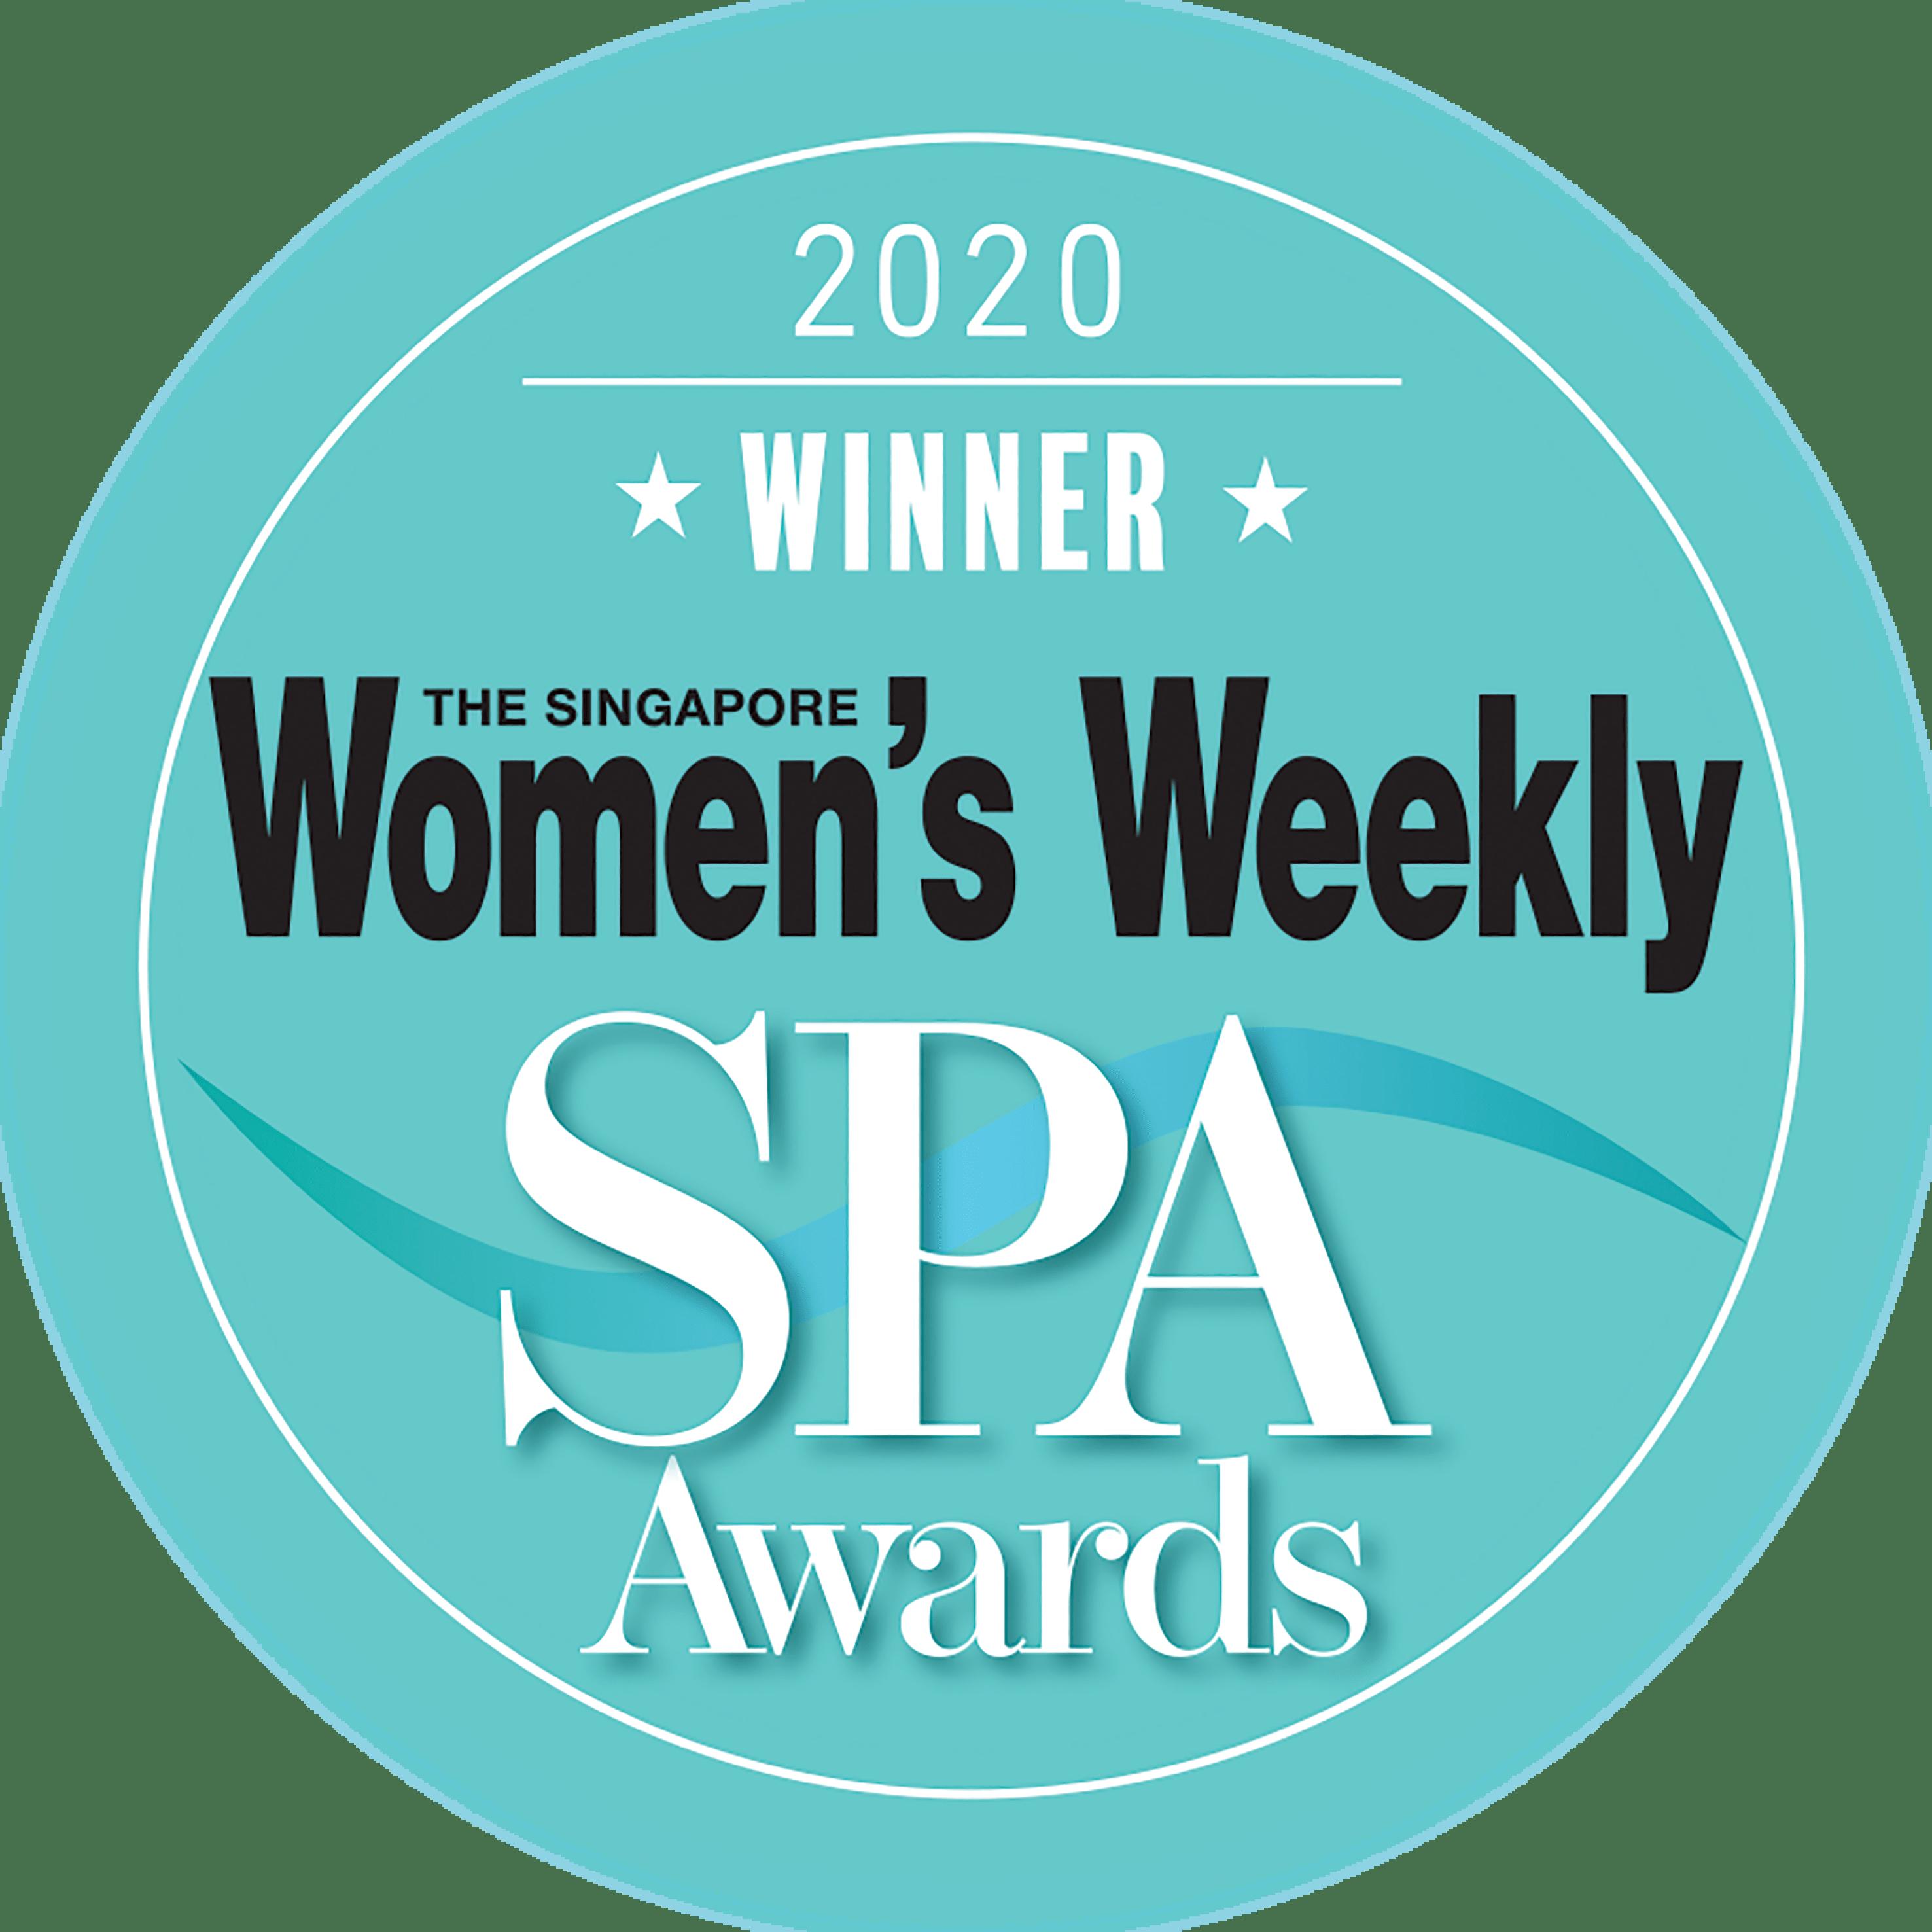 Singapore Women's Weekly SPA Awards 2020